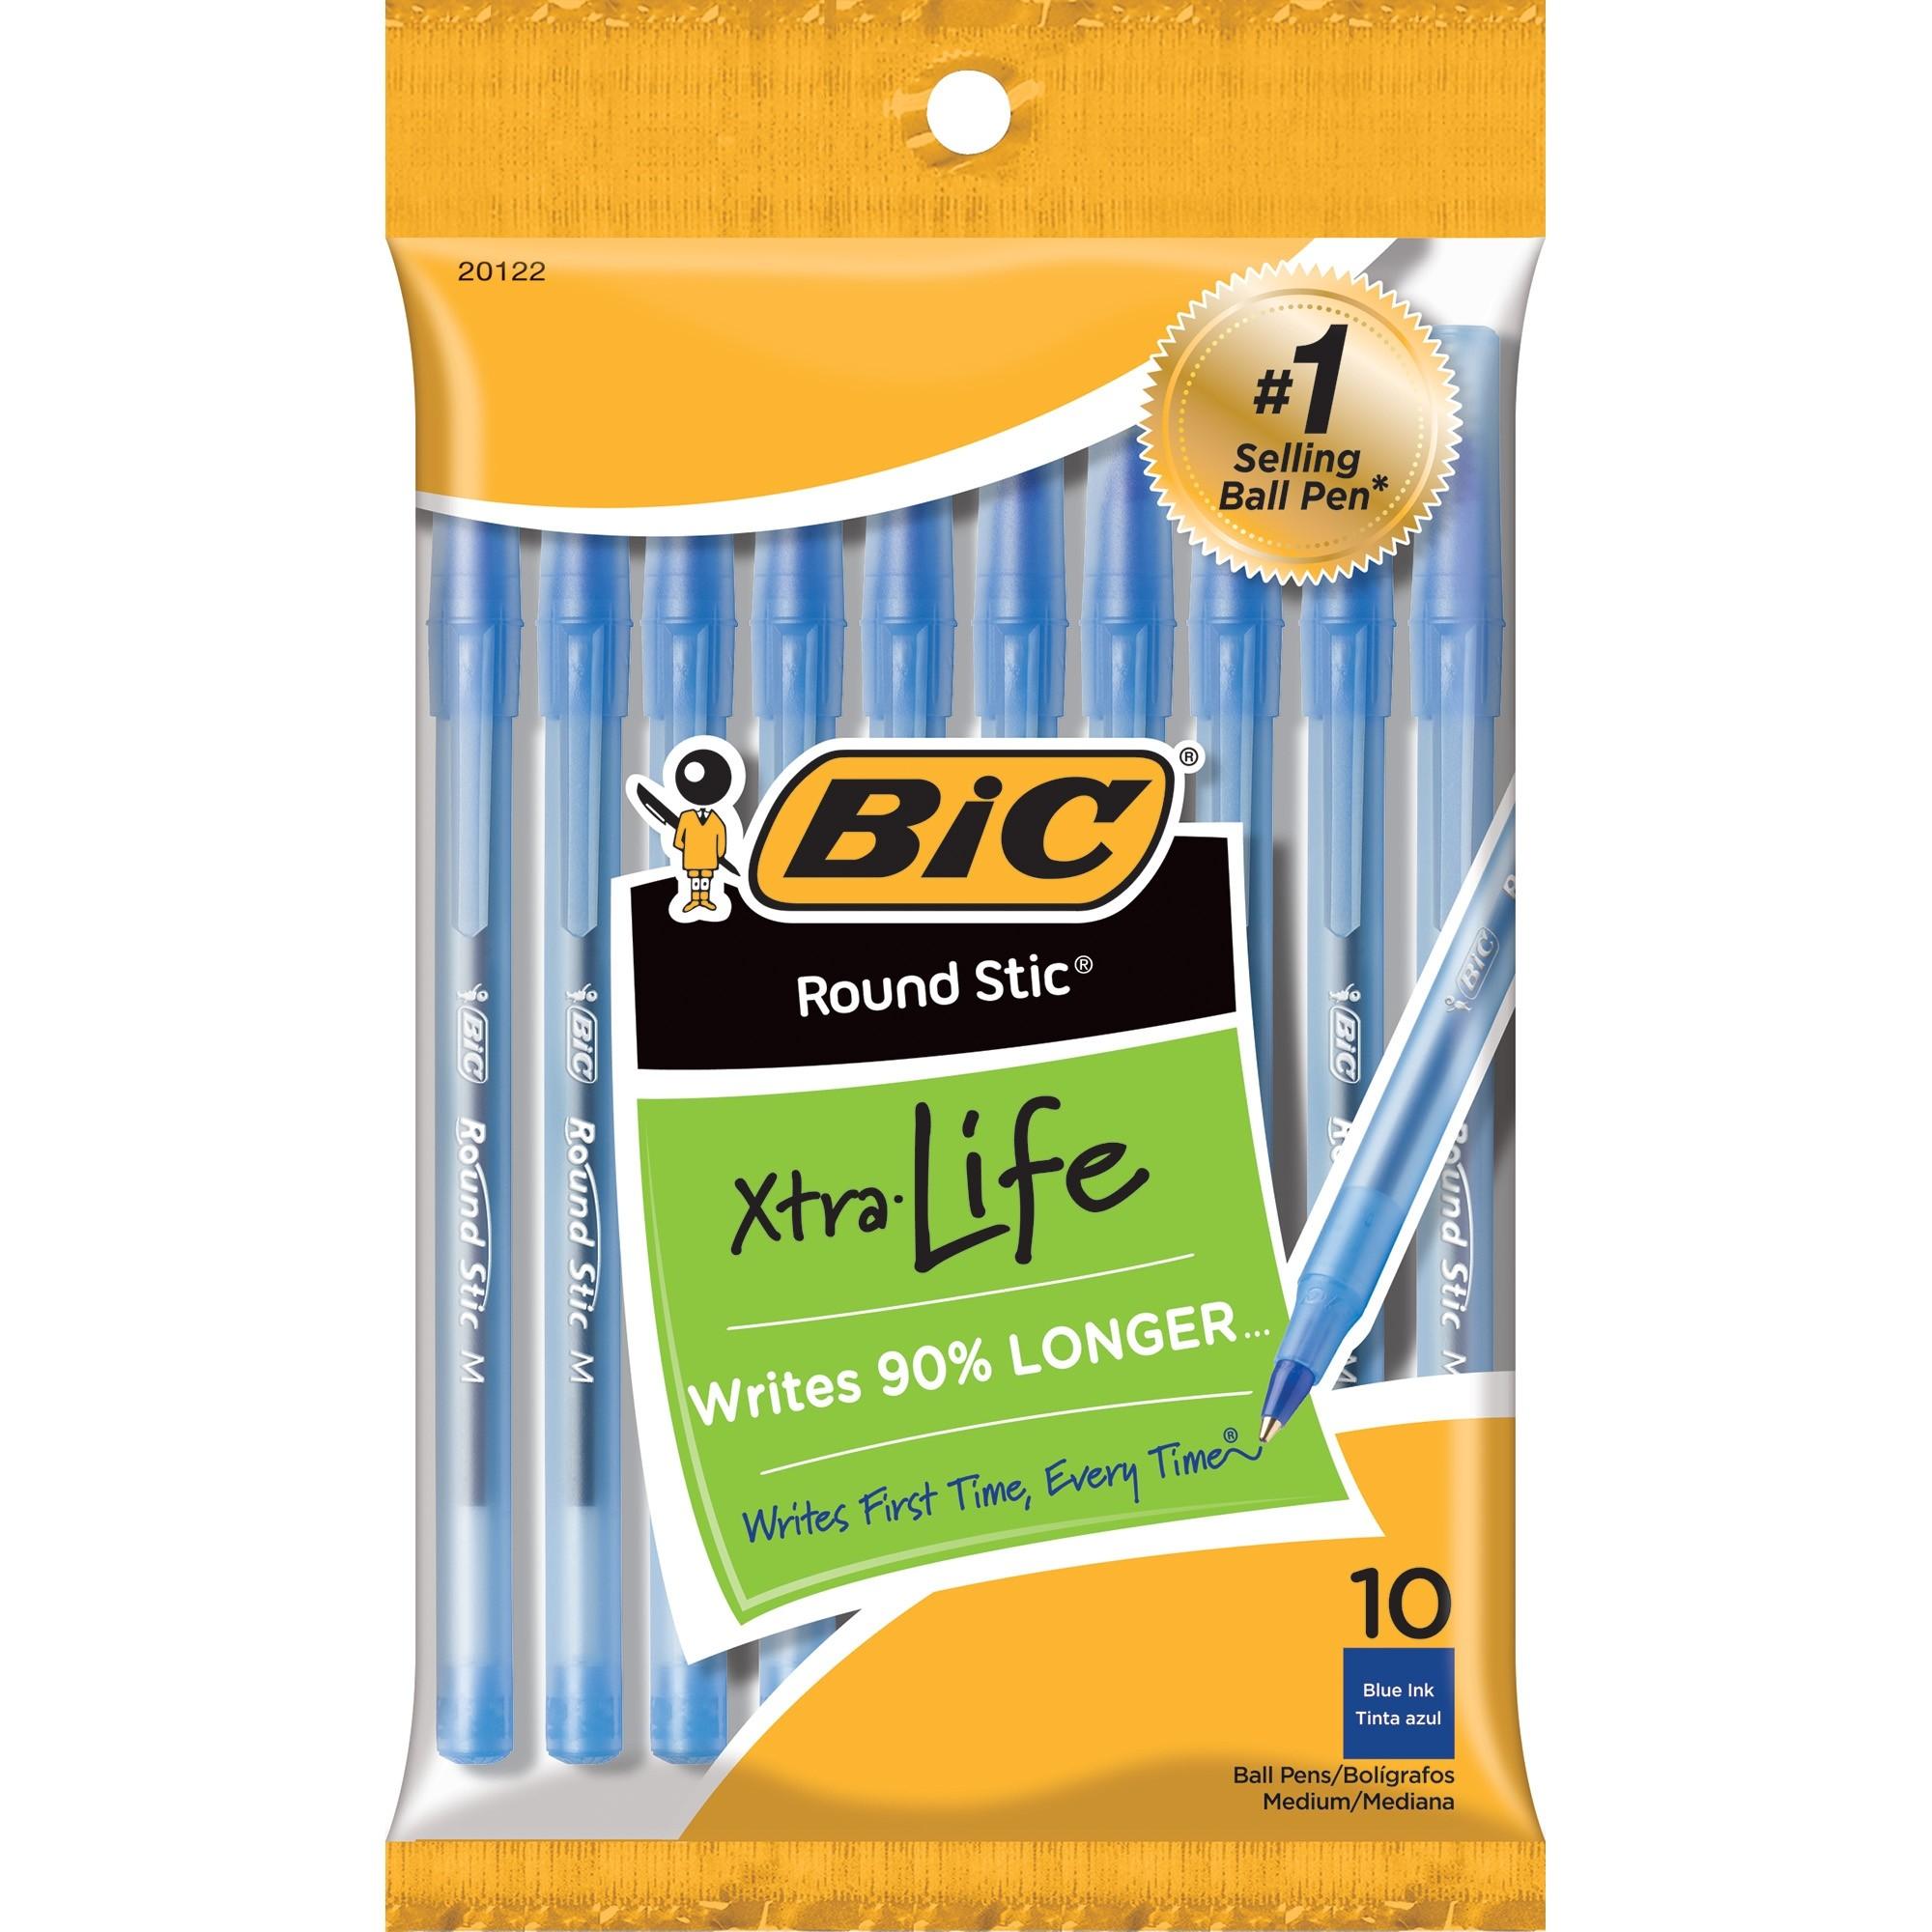 Blue Bic Pens